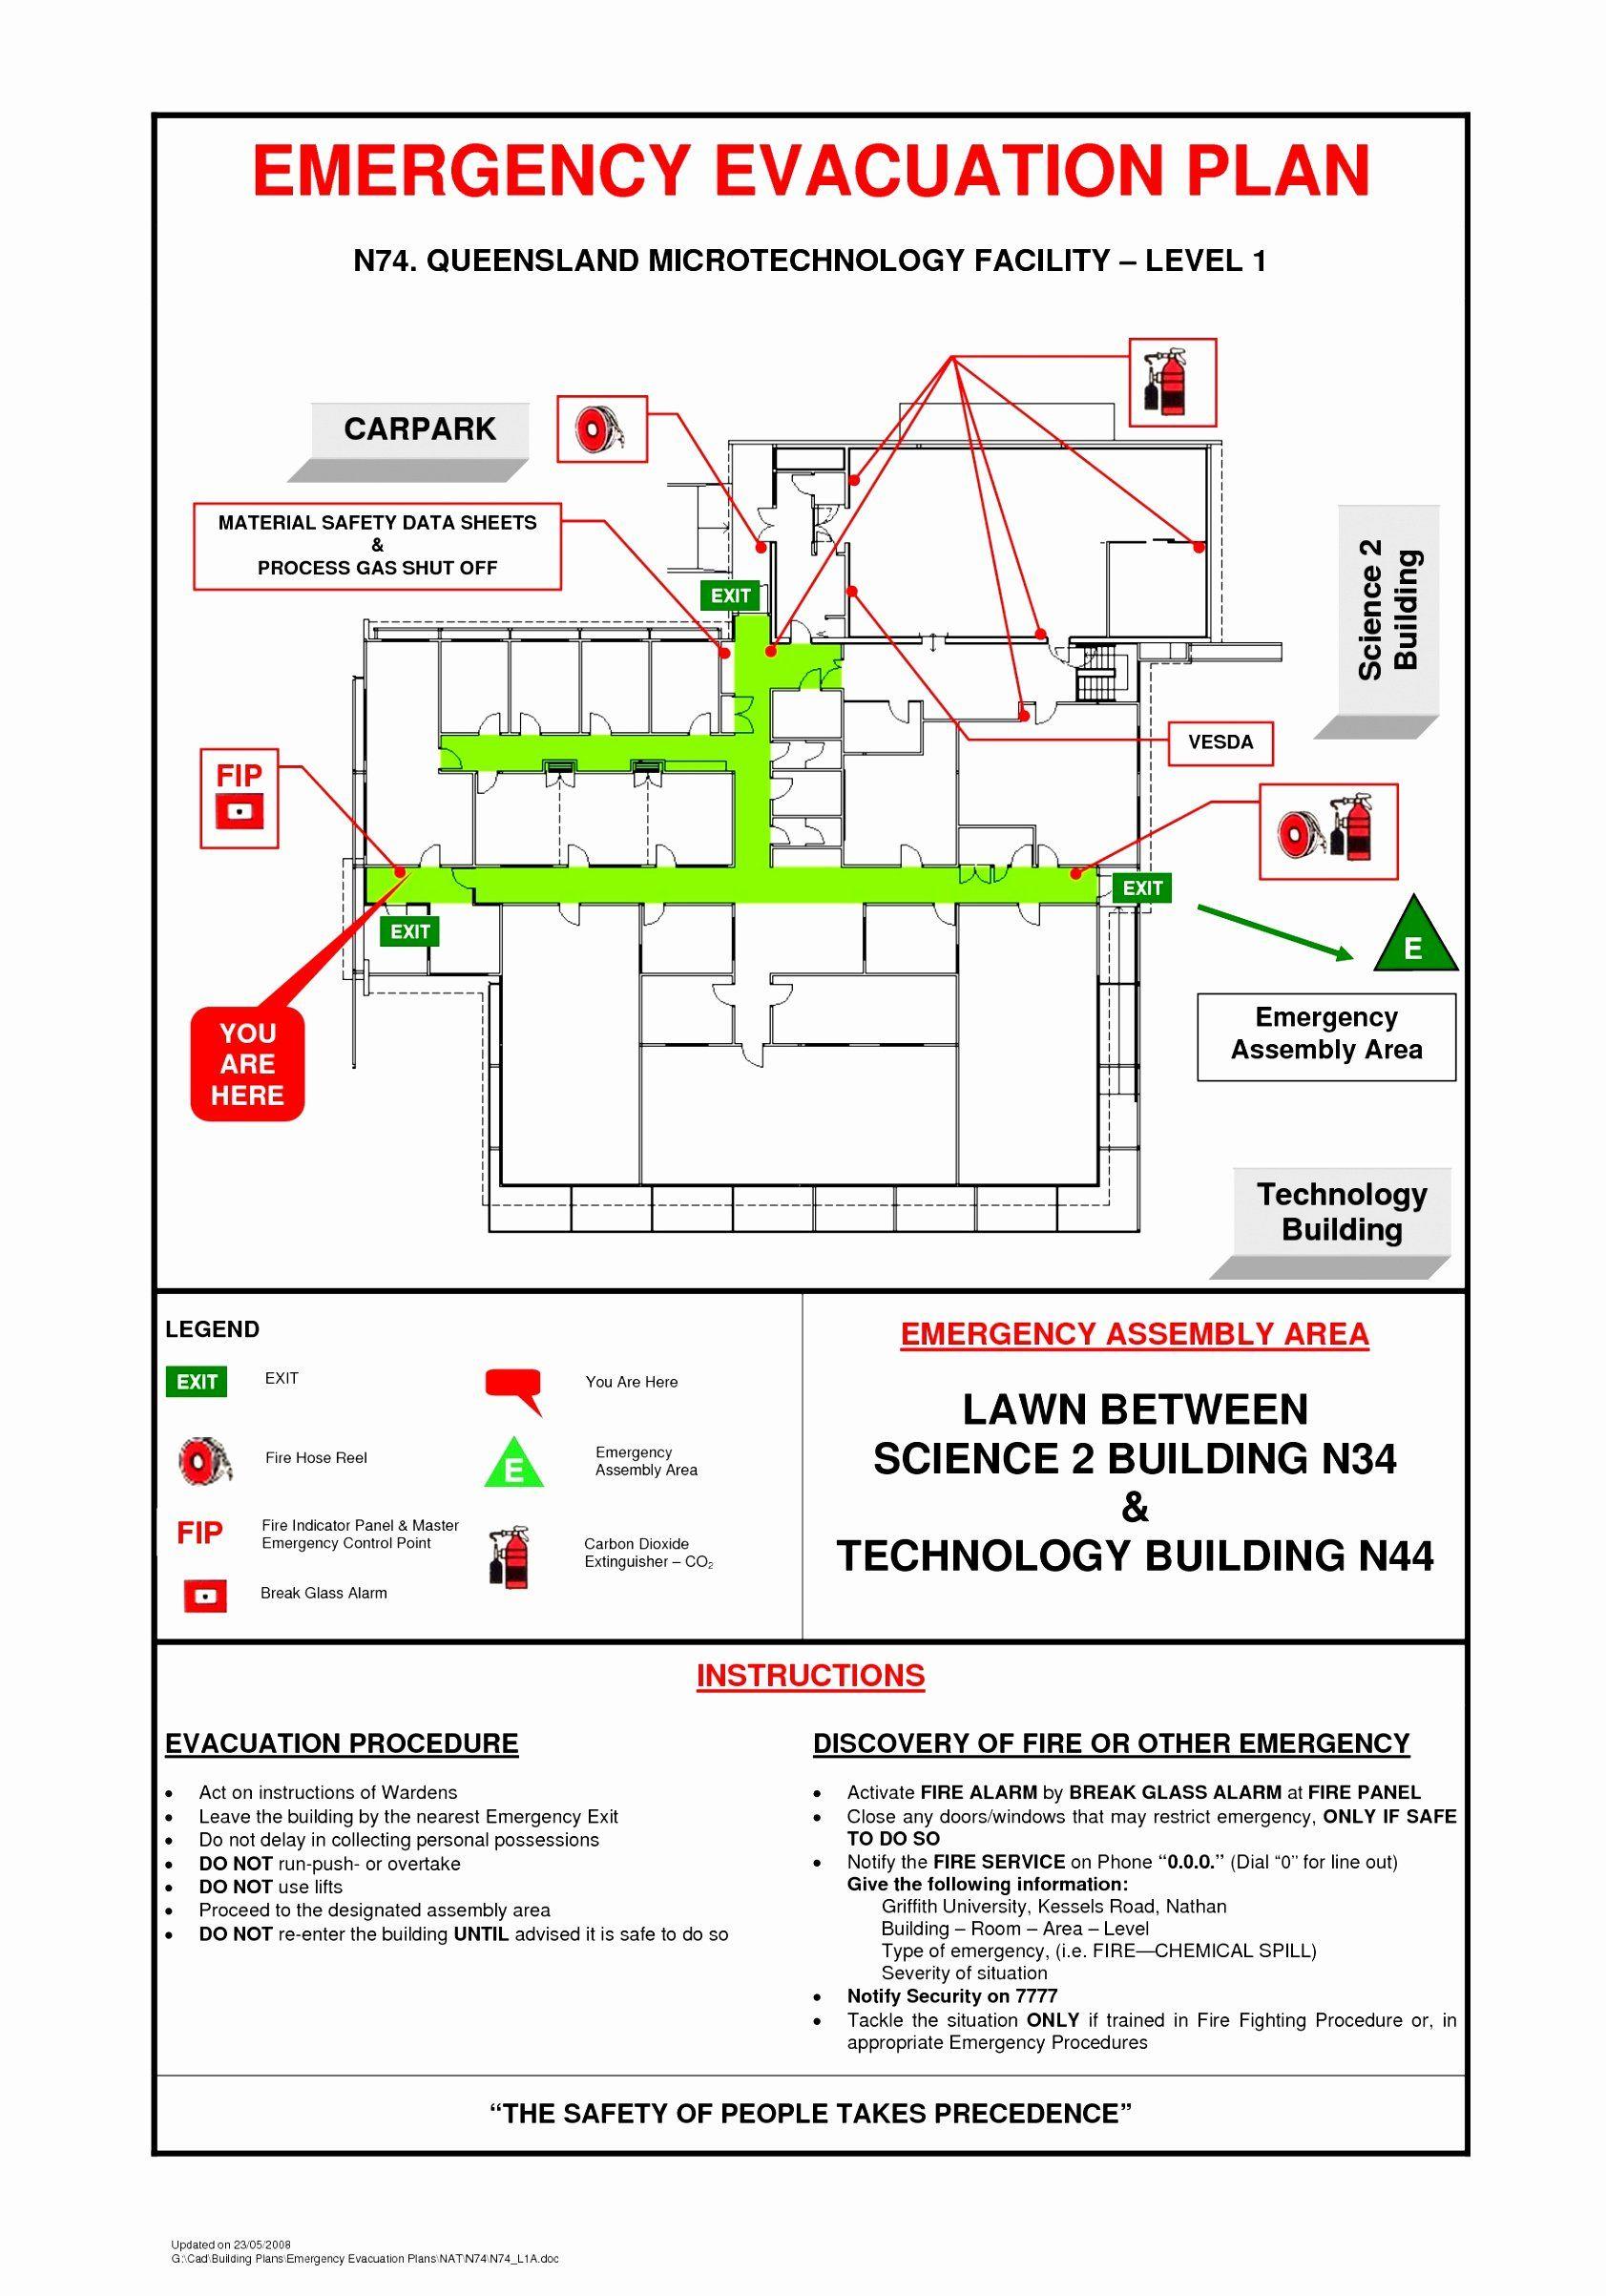 Emergency Evacuation Plan Template Free Lovely 9 Evacuation Plan Template Free Teyuo Emergency Evacuation Plan Evacuation Plan Emergency Evacuation Emergency evacuation plan template free